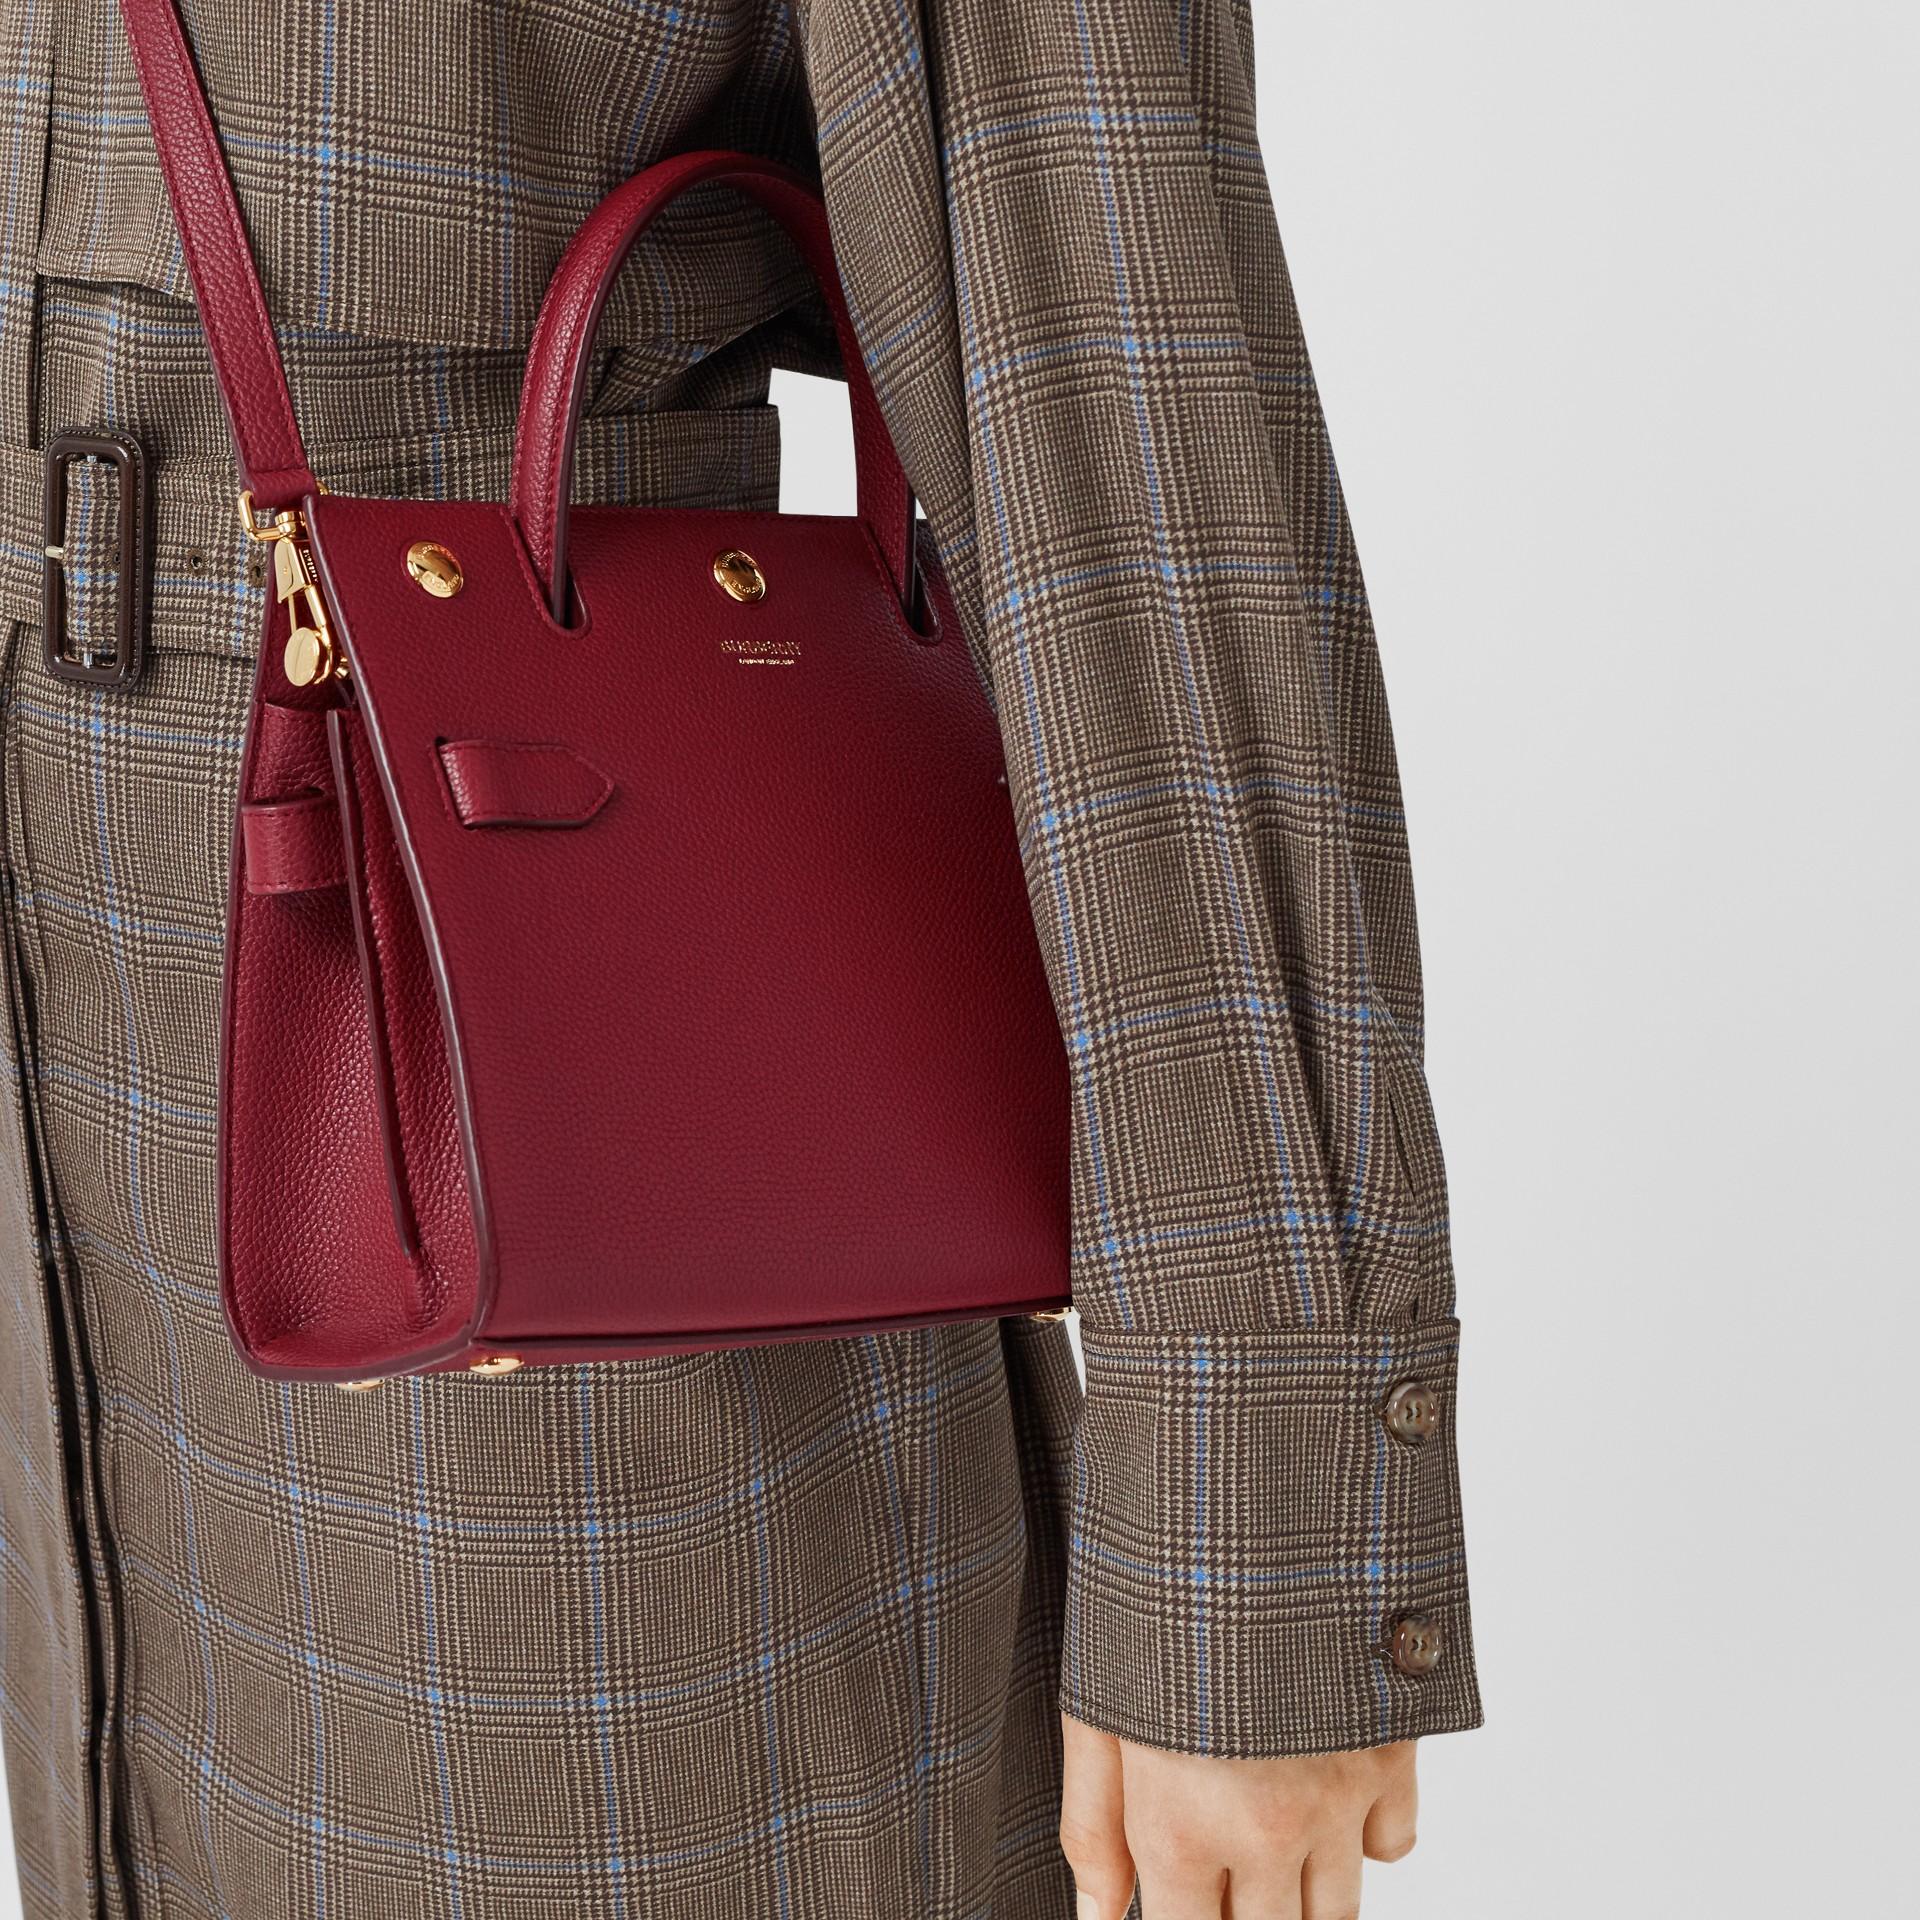 Mini Leather Title Bag in Dark Crimson - Women | Burberry United Kingdom - gallery image 8